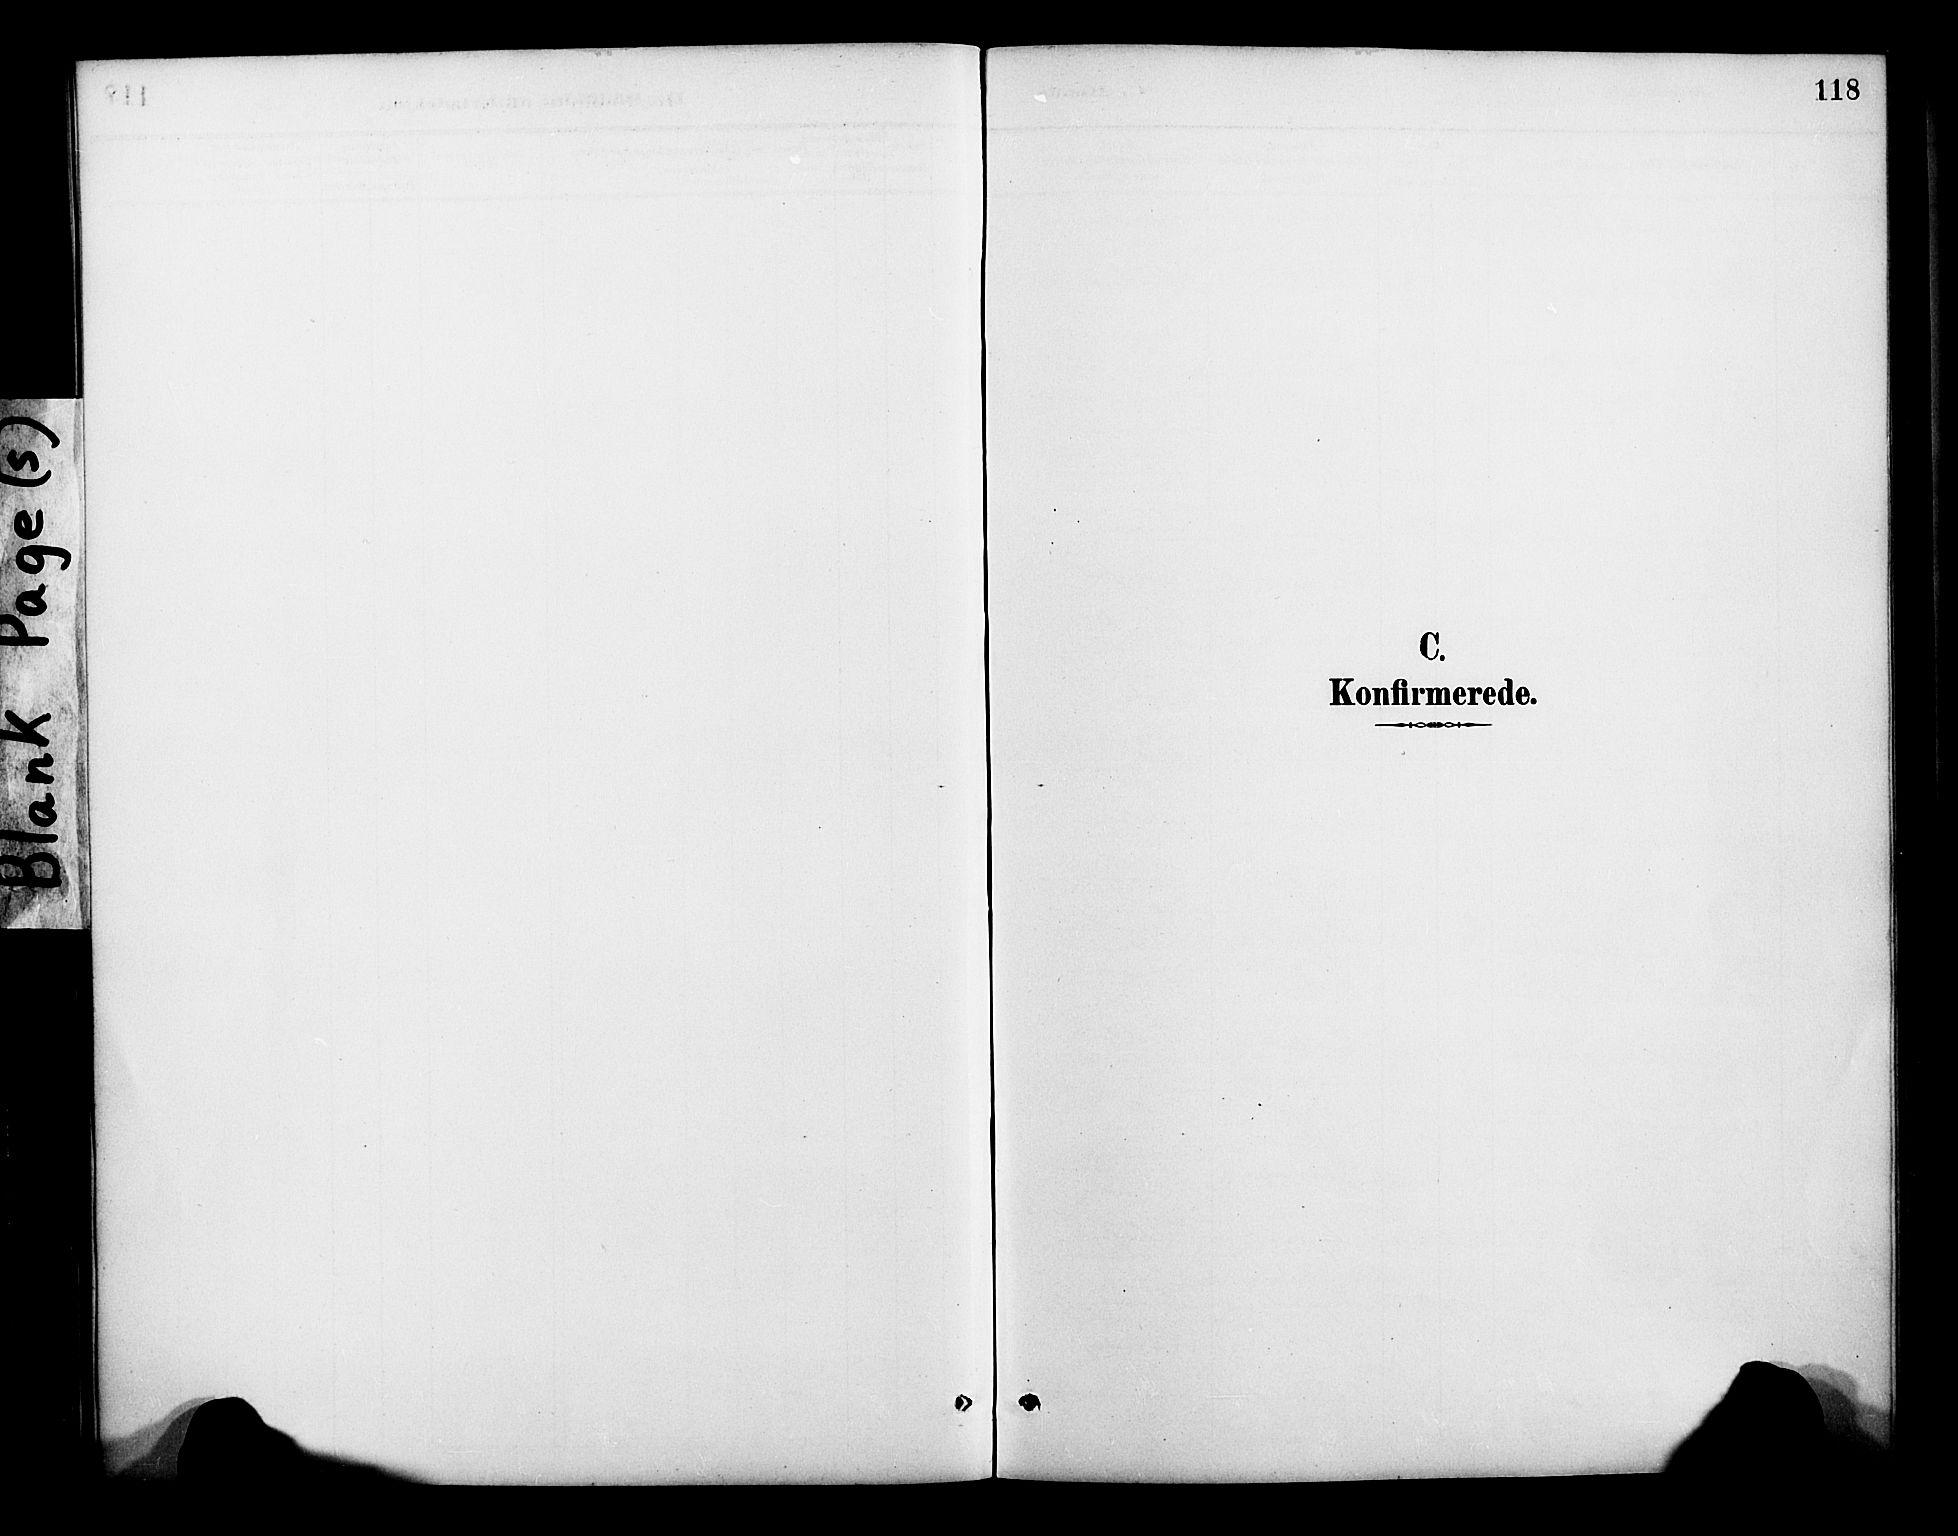 SATØ, Lenvik sokneprestembete, H/Ha: Ministerialbok nr. 13, 1890-1898, s. 118